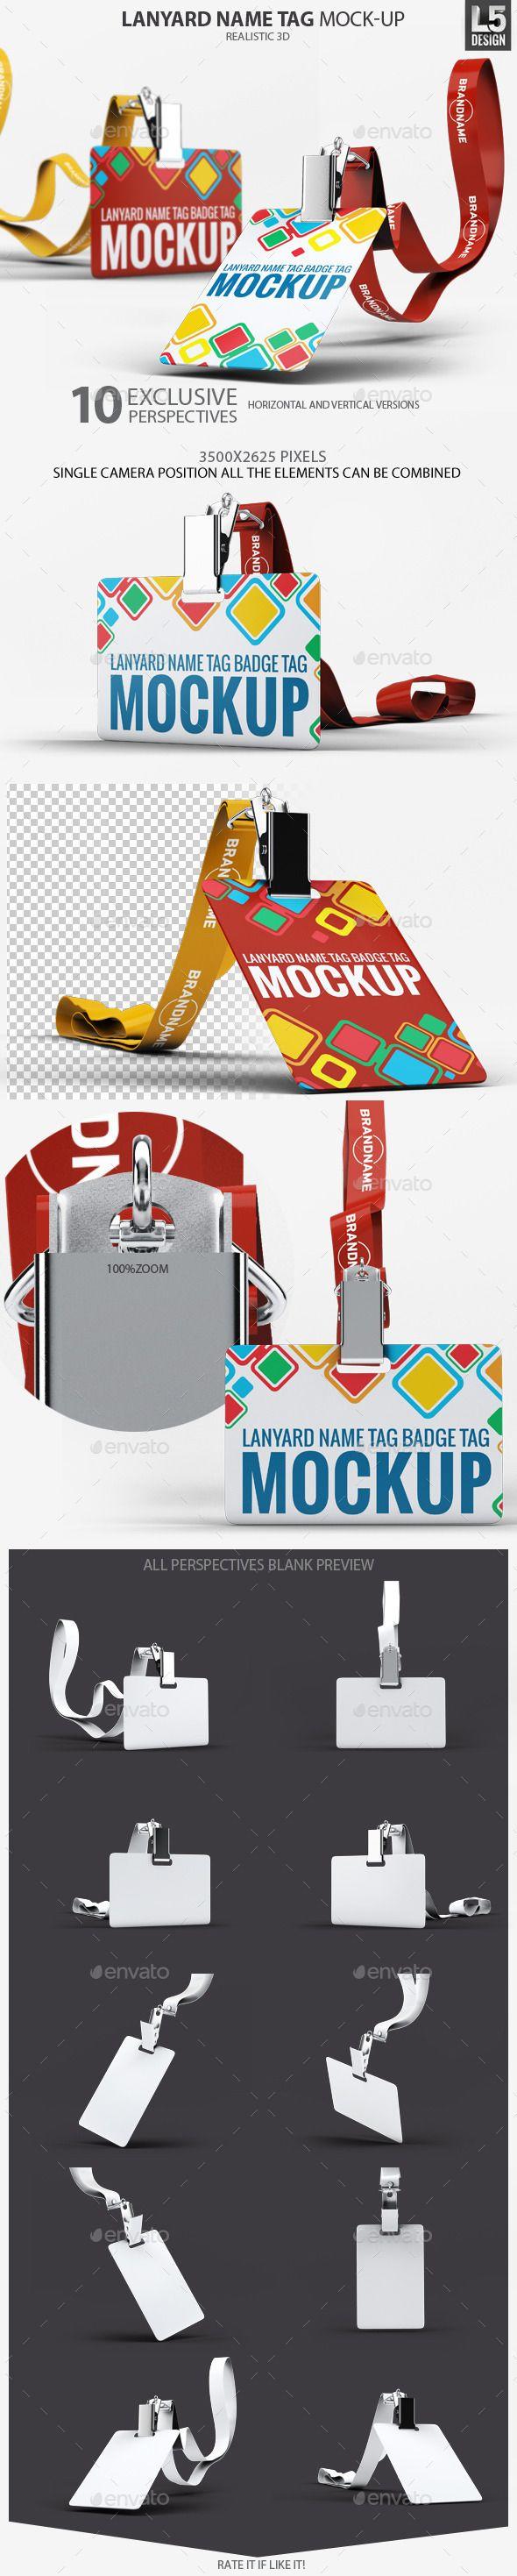 lanyard name tag badge mockup stationery pinterest mockup